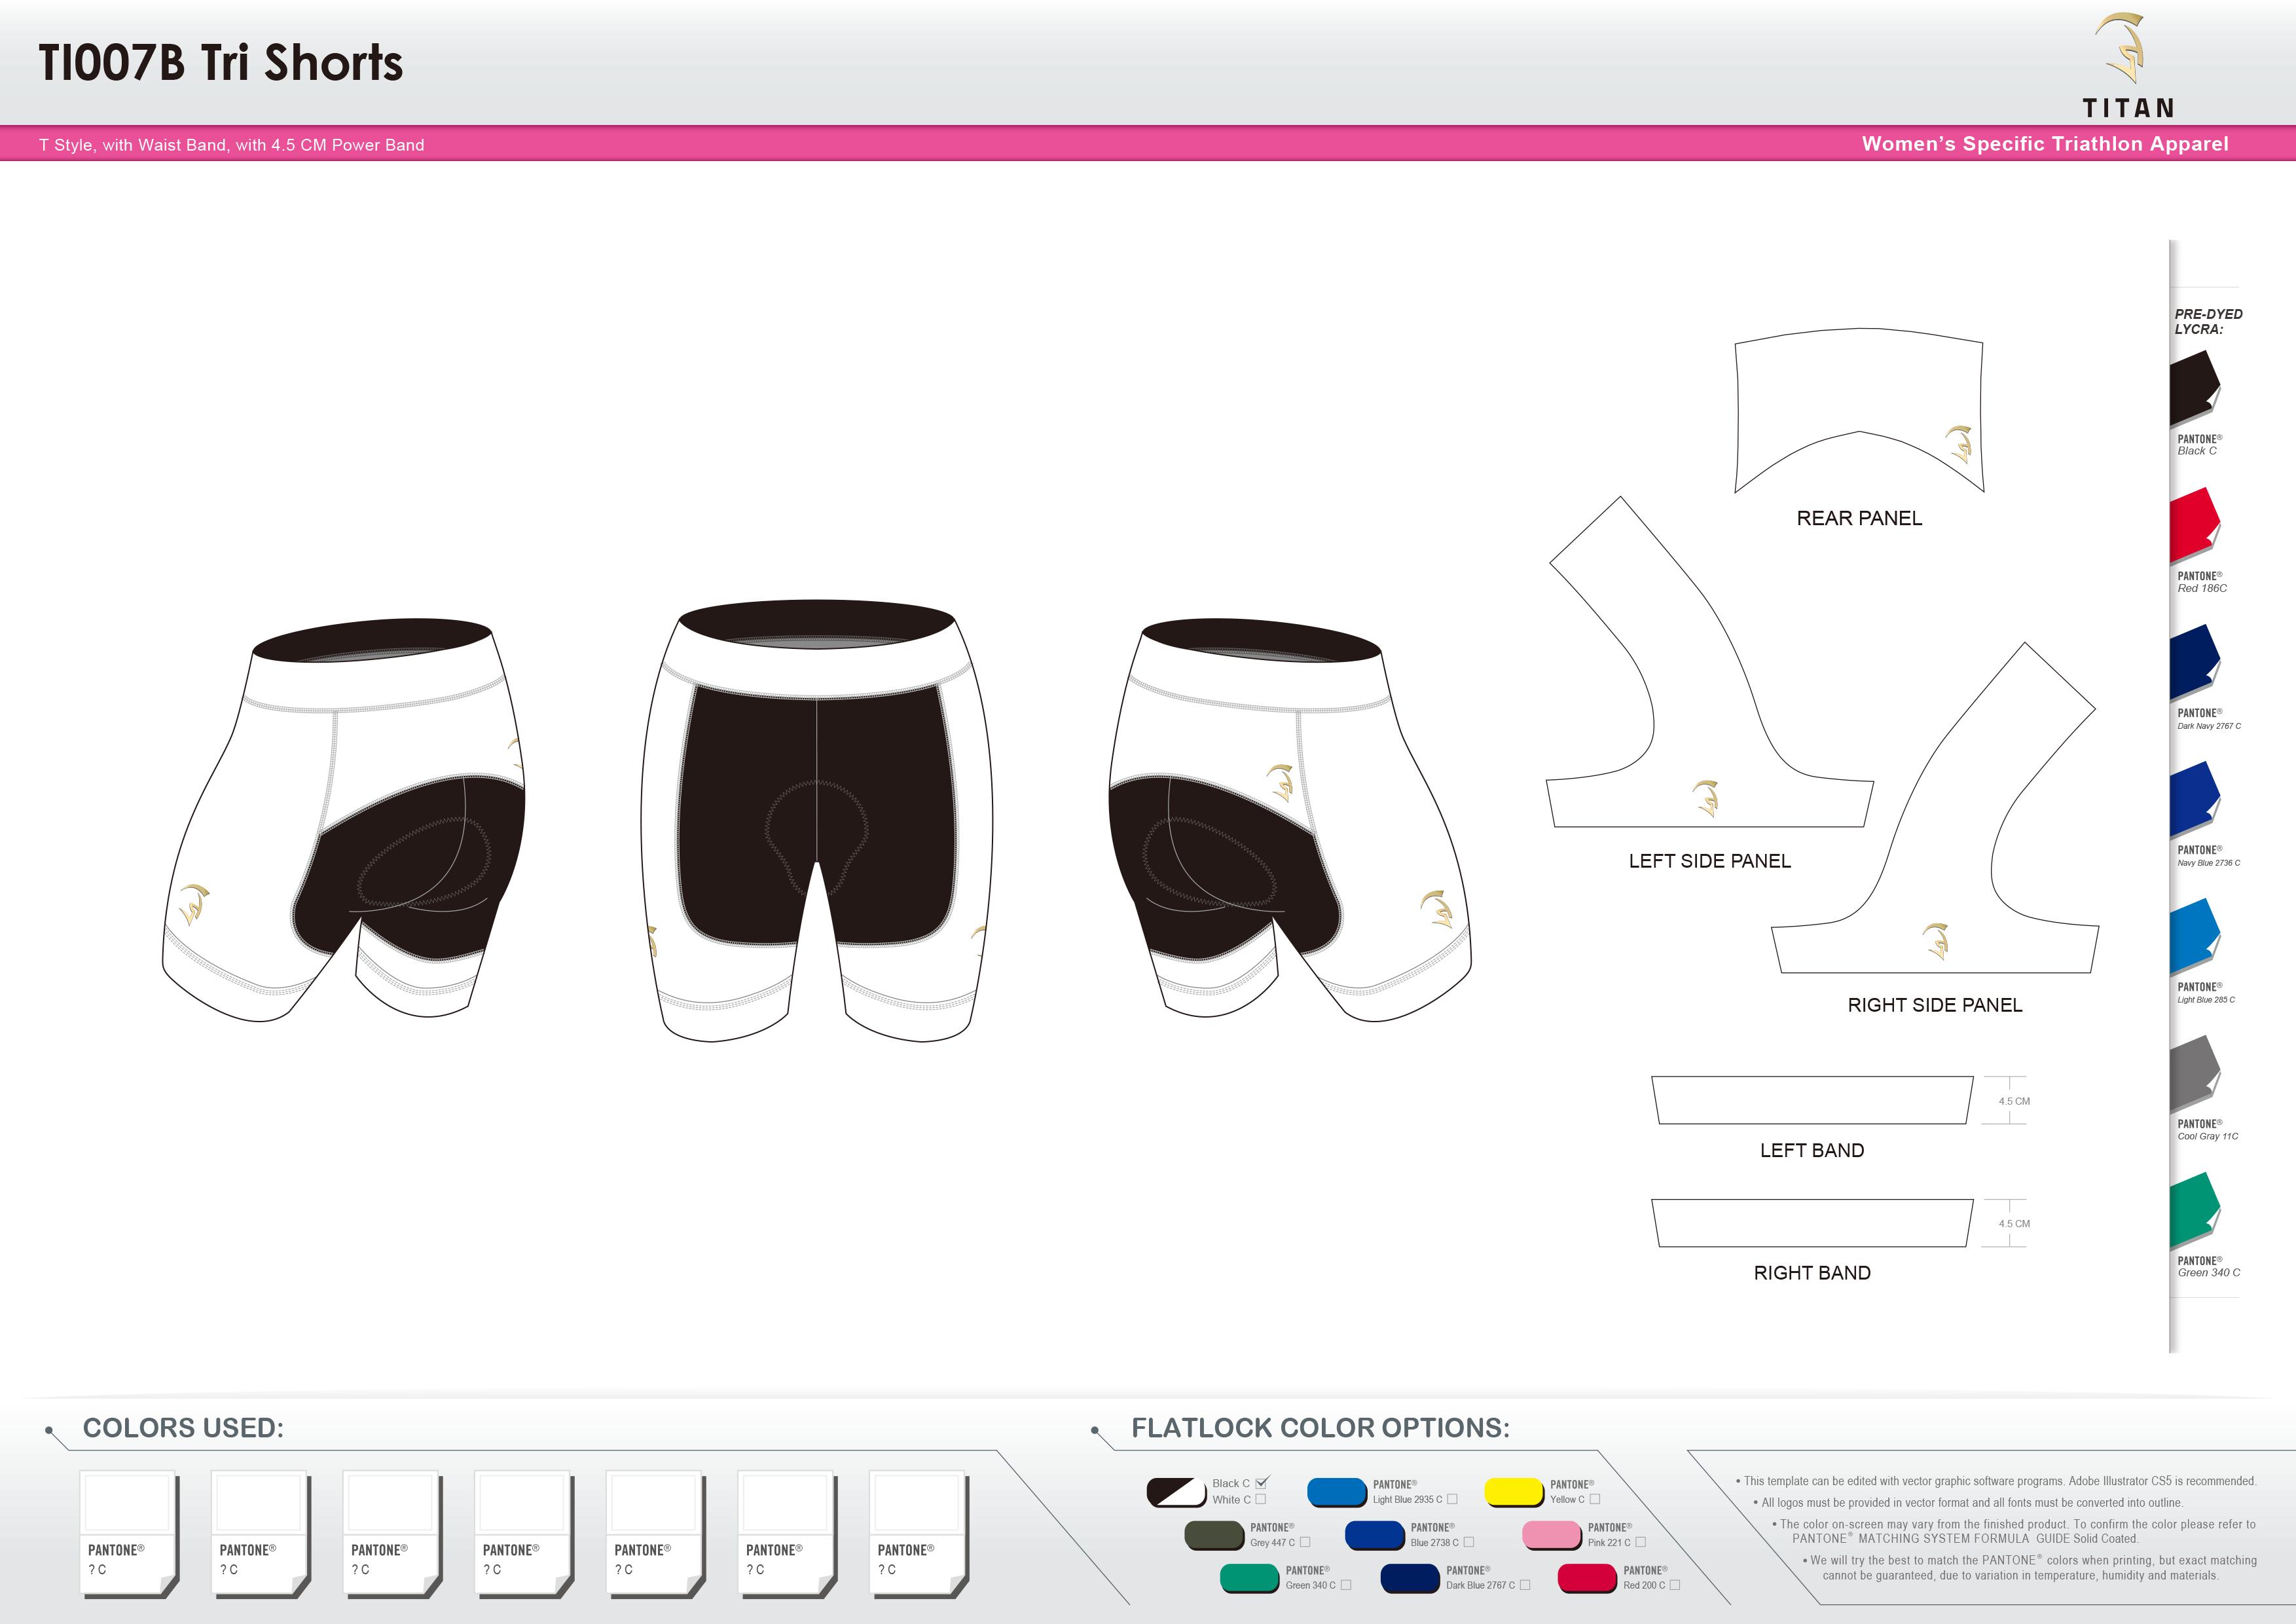 TI007B Women's Tri Shorts